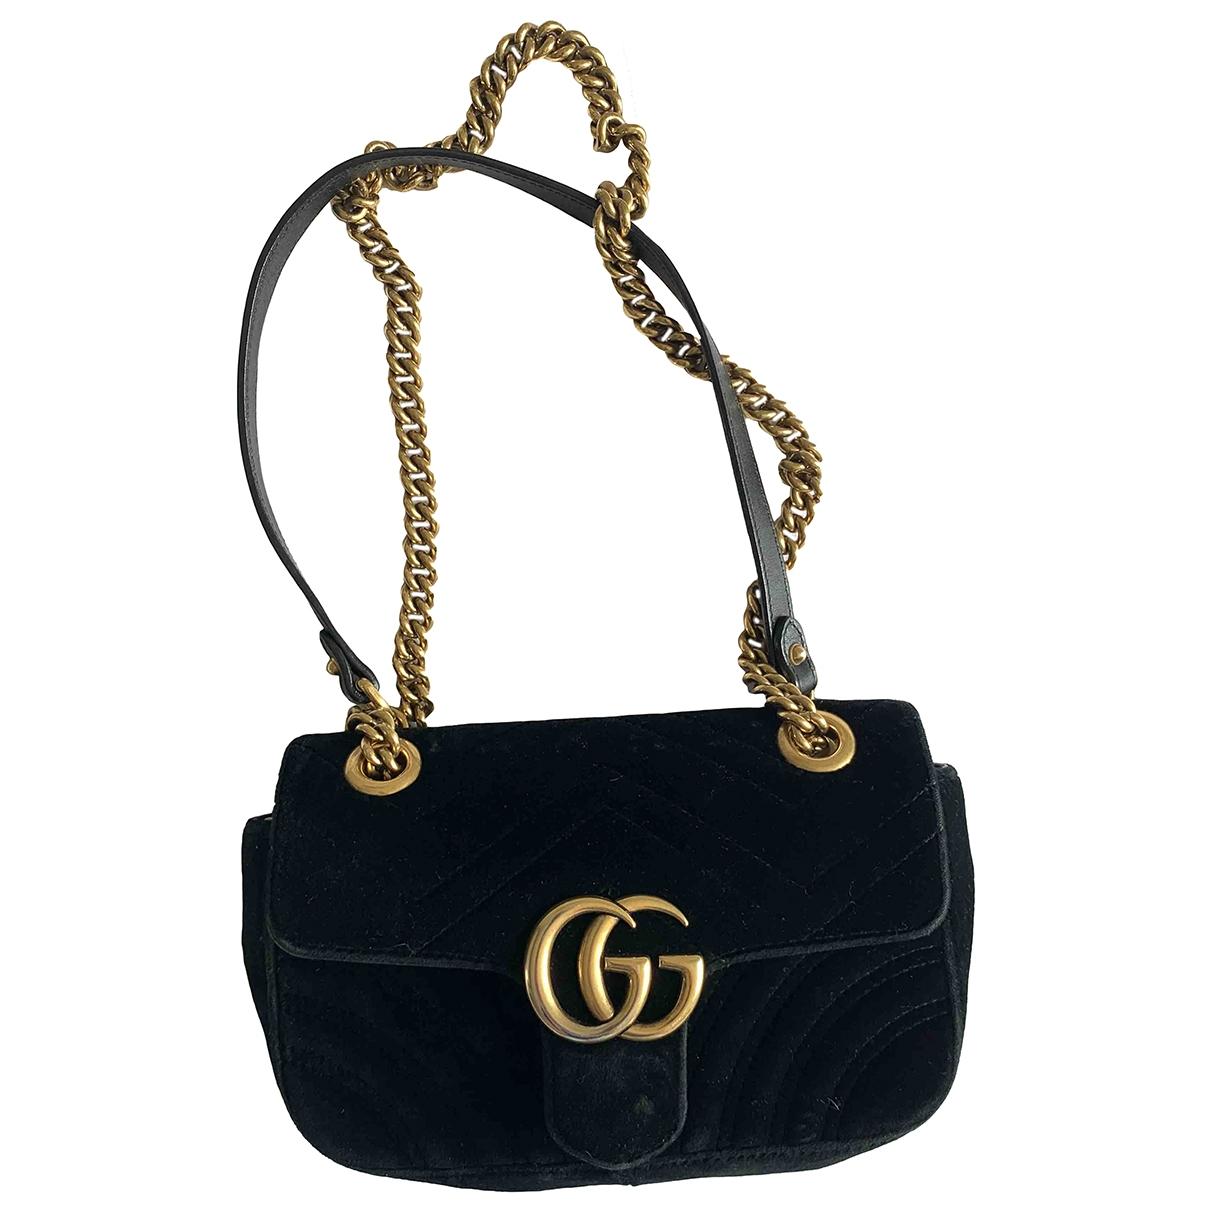 Bolso  Marmont de Terciopelo Gucci